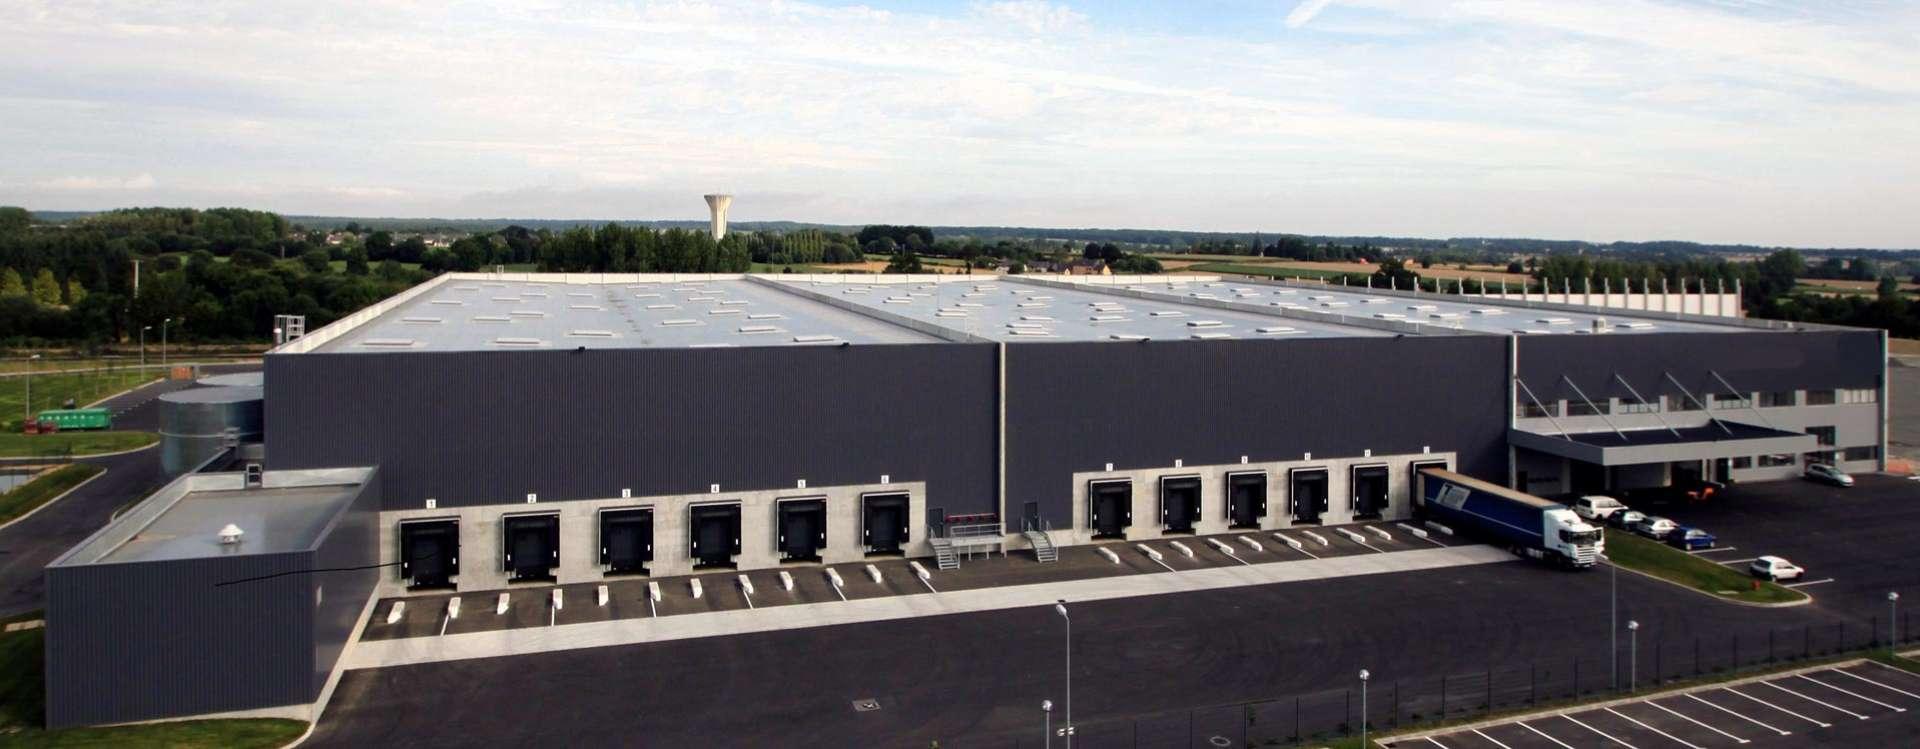 Logistics platform in Saint-Méen in Brittany, under commercialisation